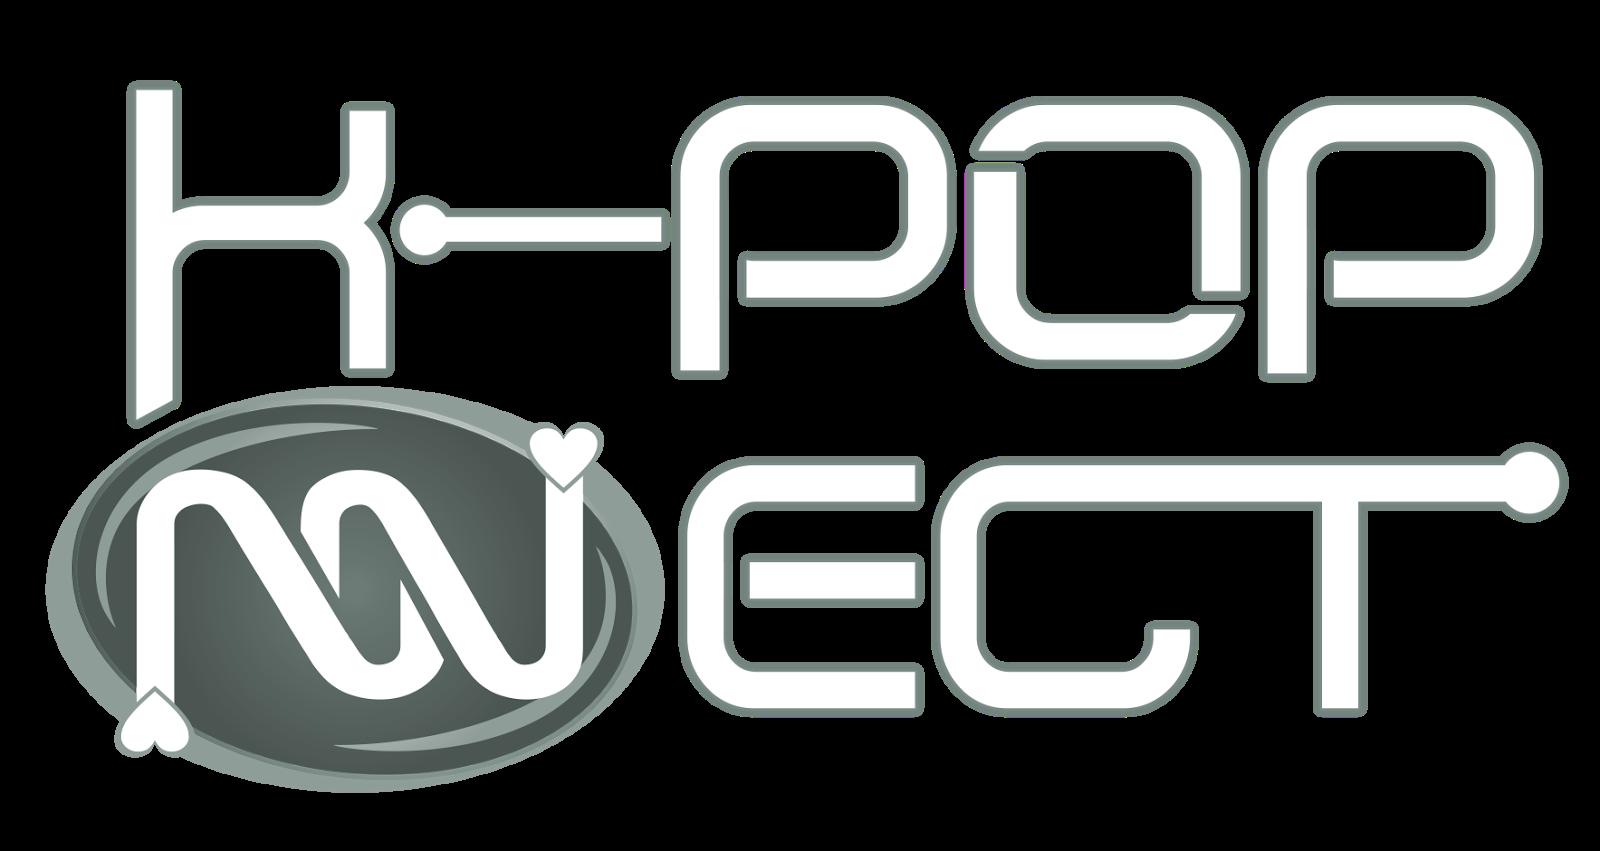 Kpopnnect